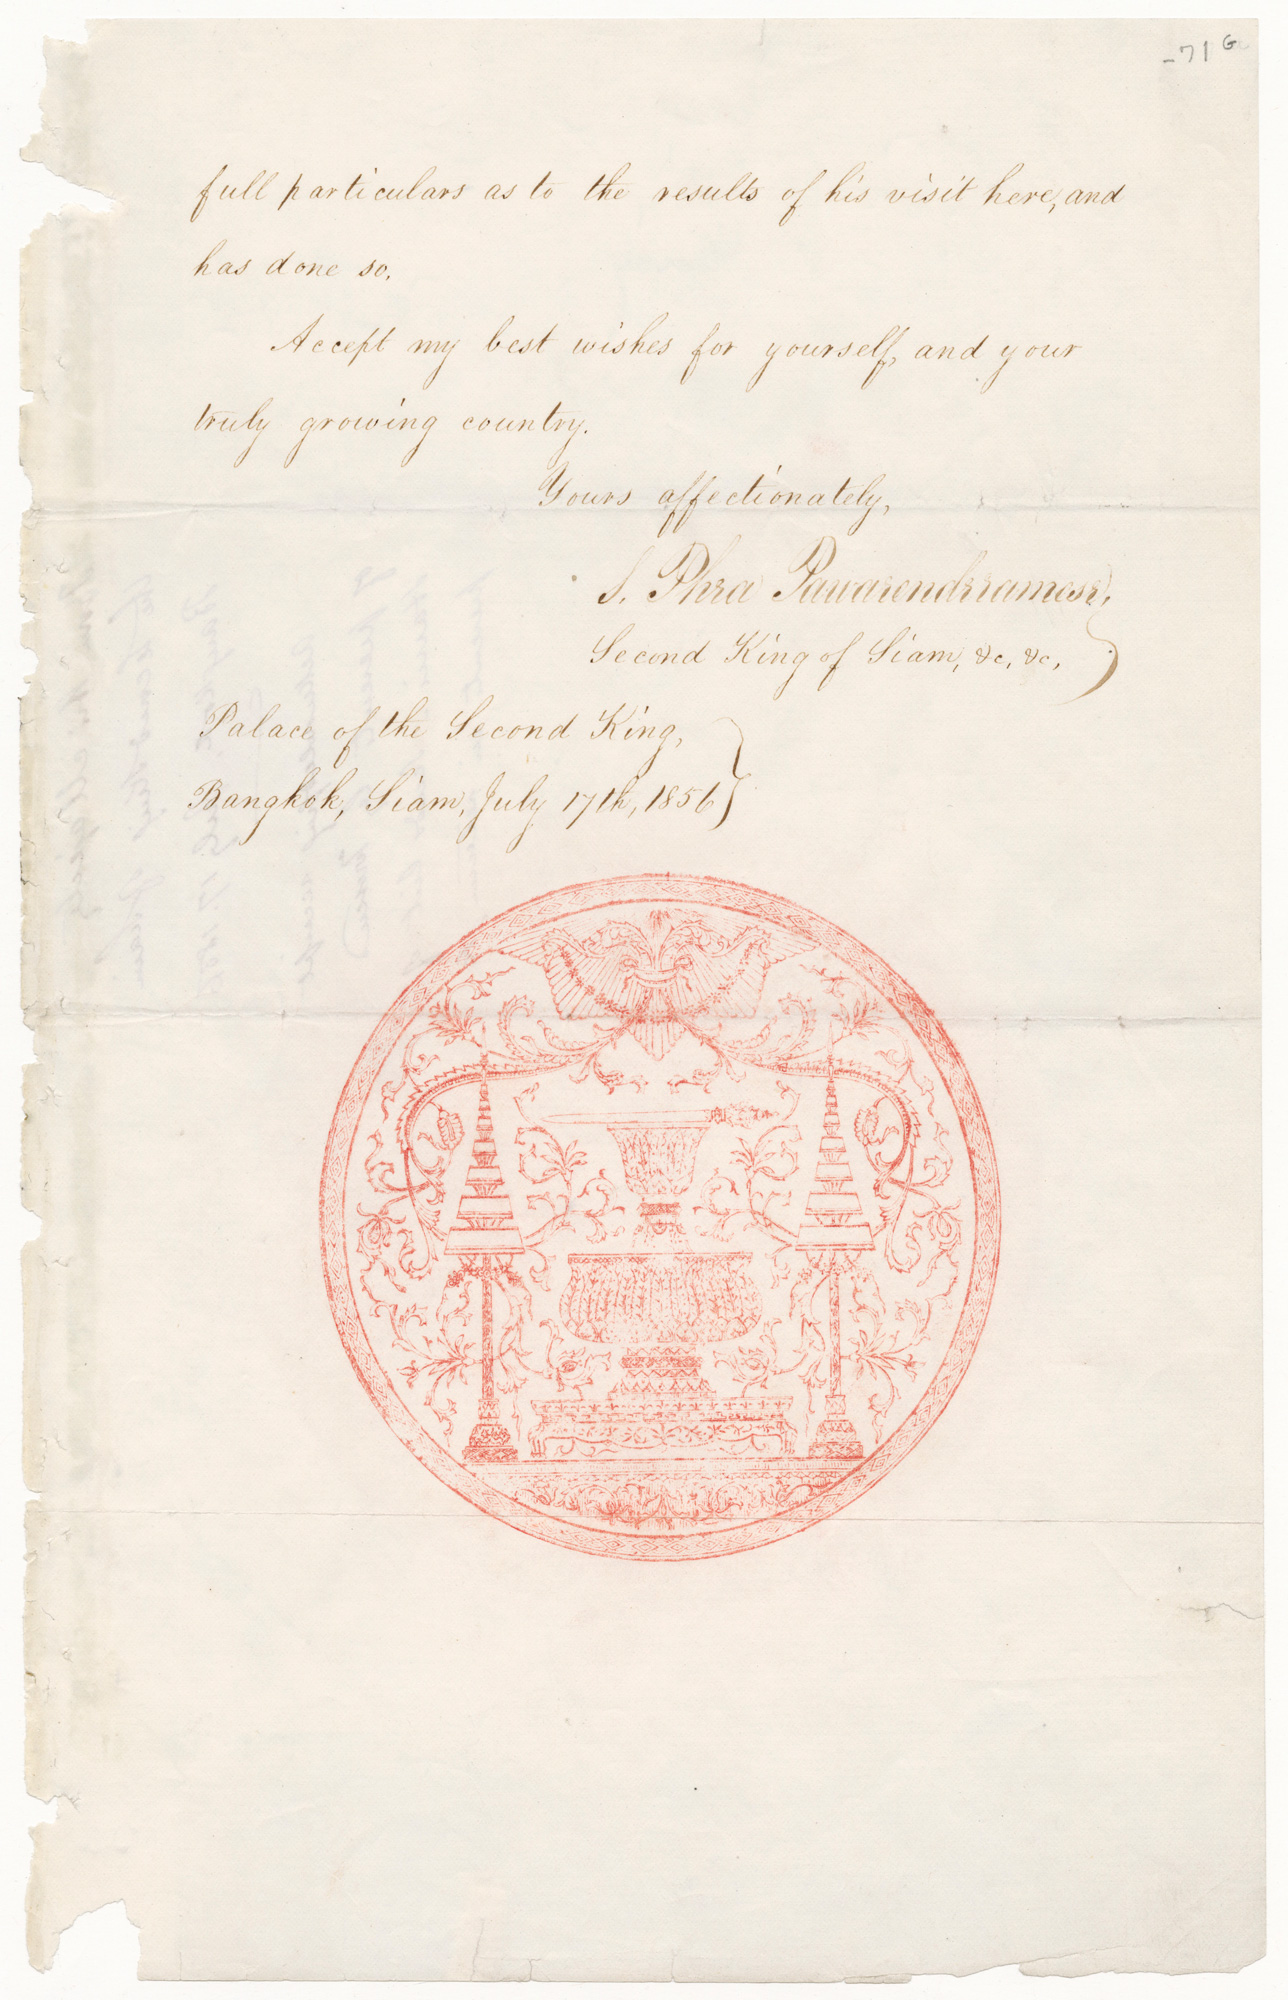 Letter from Second King Pinklao to President Franklin Pierce (excerpt), 1856 Courtesy of the National Archives and Records Administration, General Records of the United States Government; 6923526  พระราชสาส์นในพระบาทสมเด็จพระปิ่นเกล้าเจ้าอยู่หัว พระราชทานแก่ประธานาธิบดีแฟรงกลิน เพียร์ซ (ตัดมาบางส่วน) พ.ศ. ๒๓๙๙ ได้รับความอนุเคราะห์จากแผนกบันทึกทั่วไปของรัฐบาลสหรัฐอเมริกา องค์การบริหารจดหมายเหตุและบันทึกแห่งชาติ; 6923526